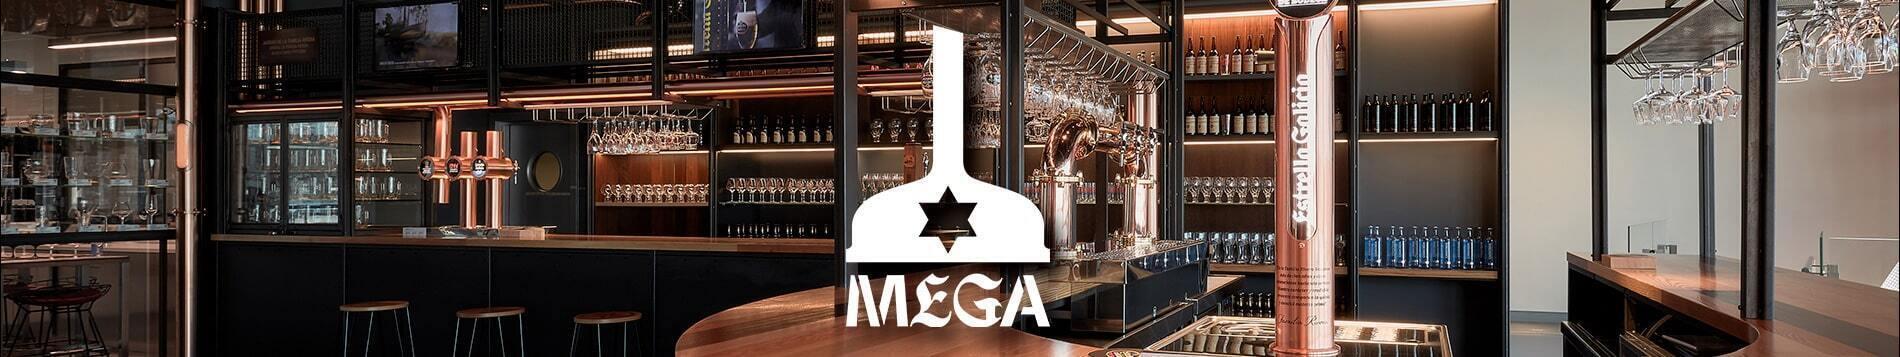 Mega: Mundo Estrella Galicia